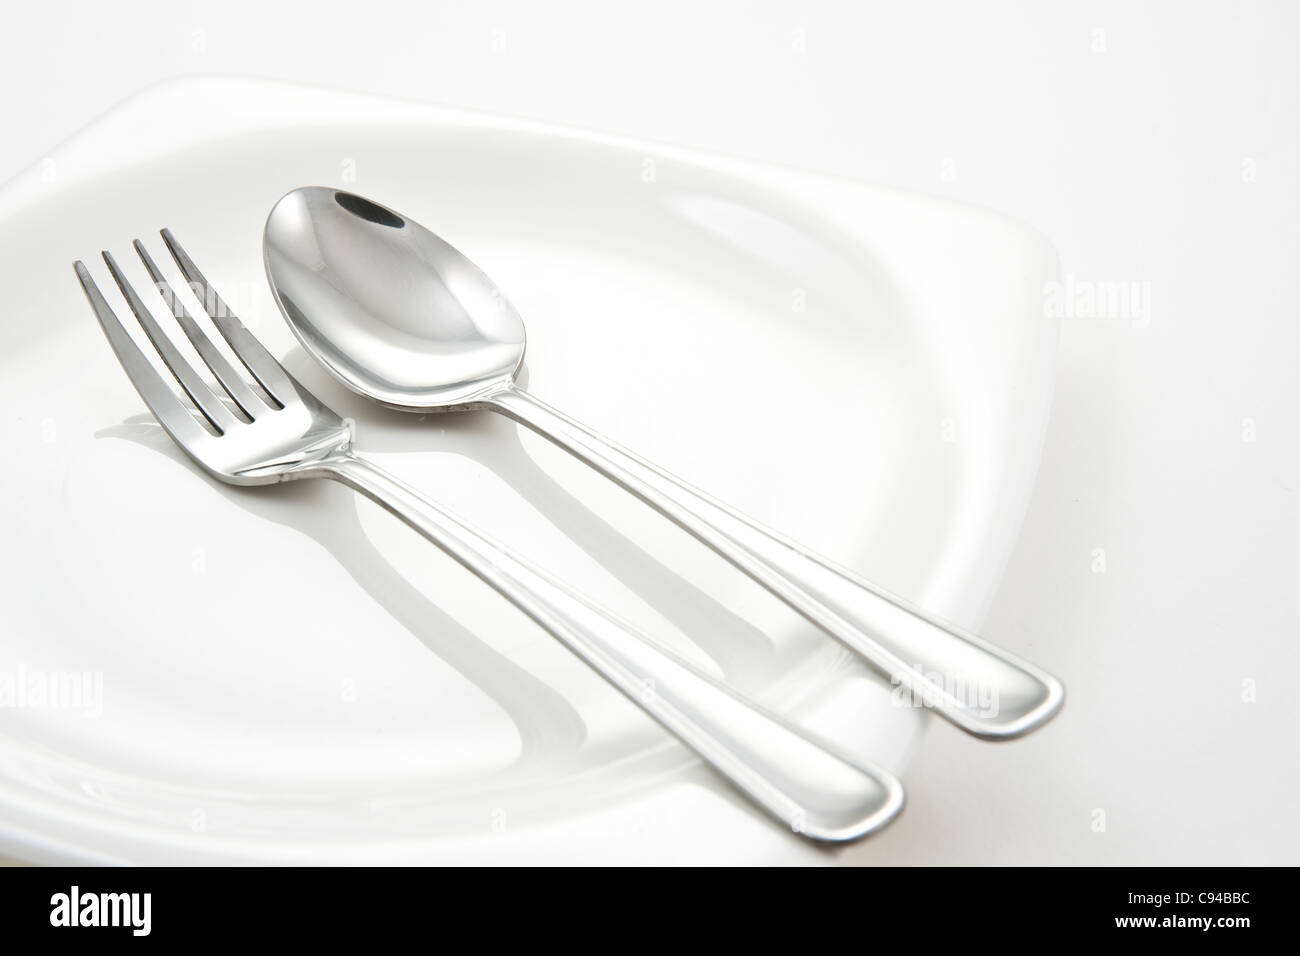 Fourchette et cuillère on white plate Photo Stock